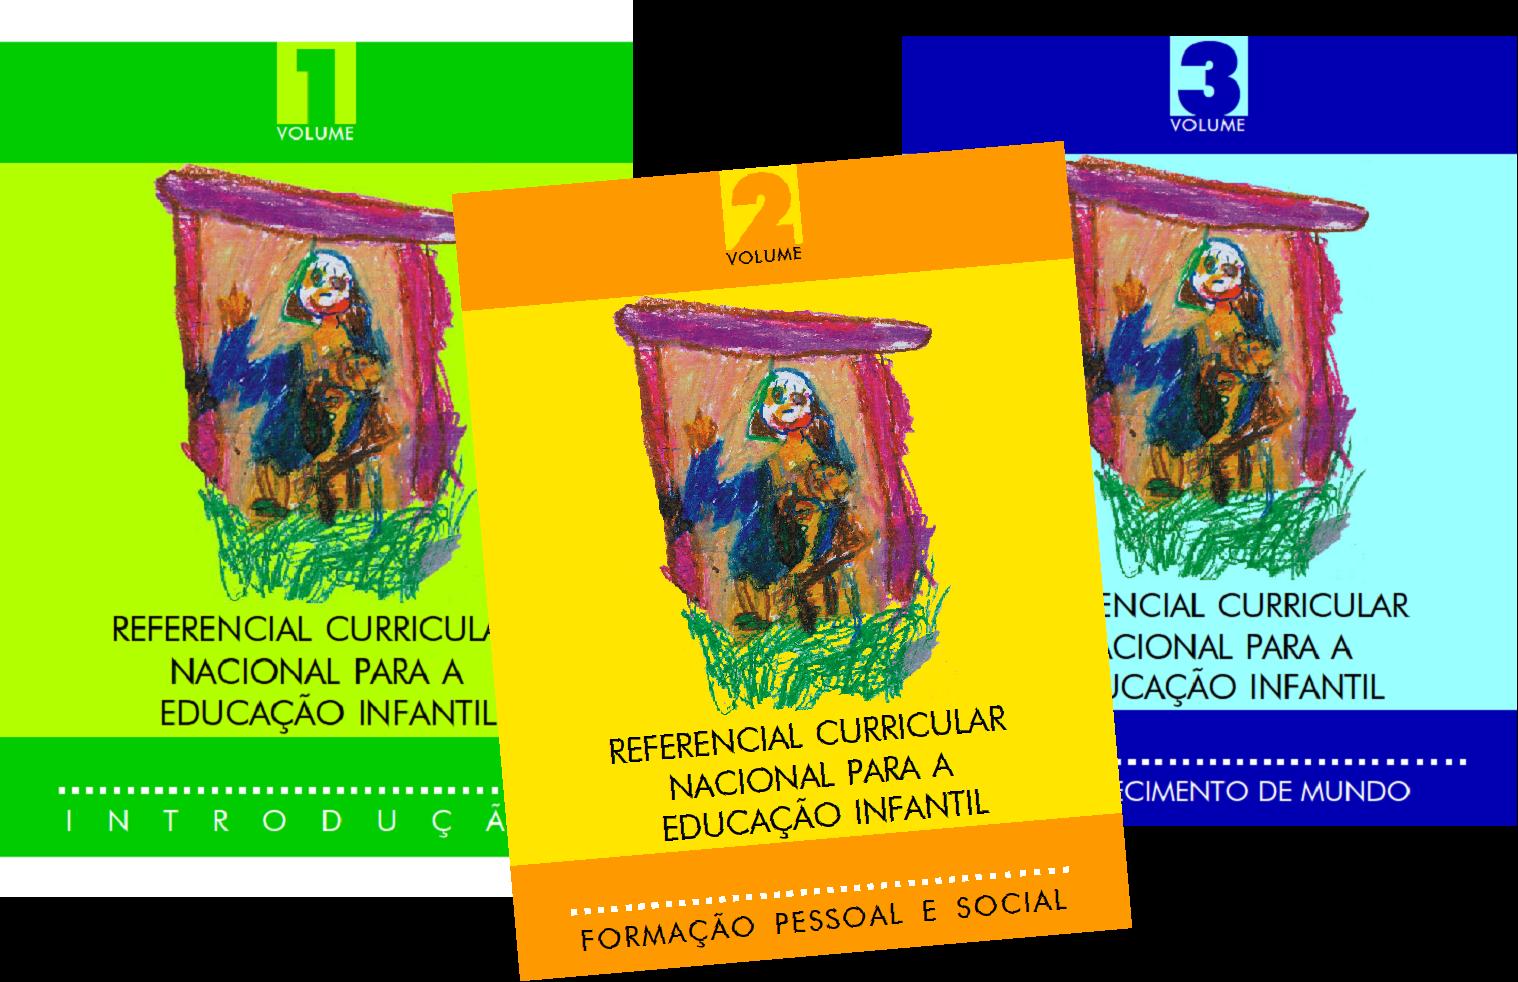 referencial curricular da educao infantil volume 3